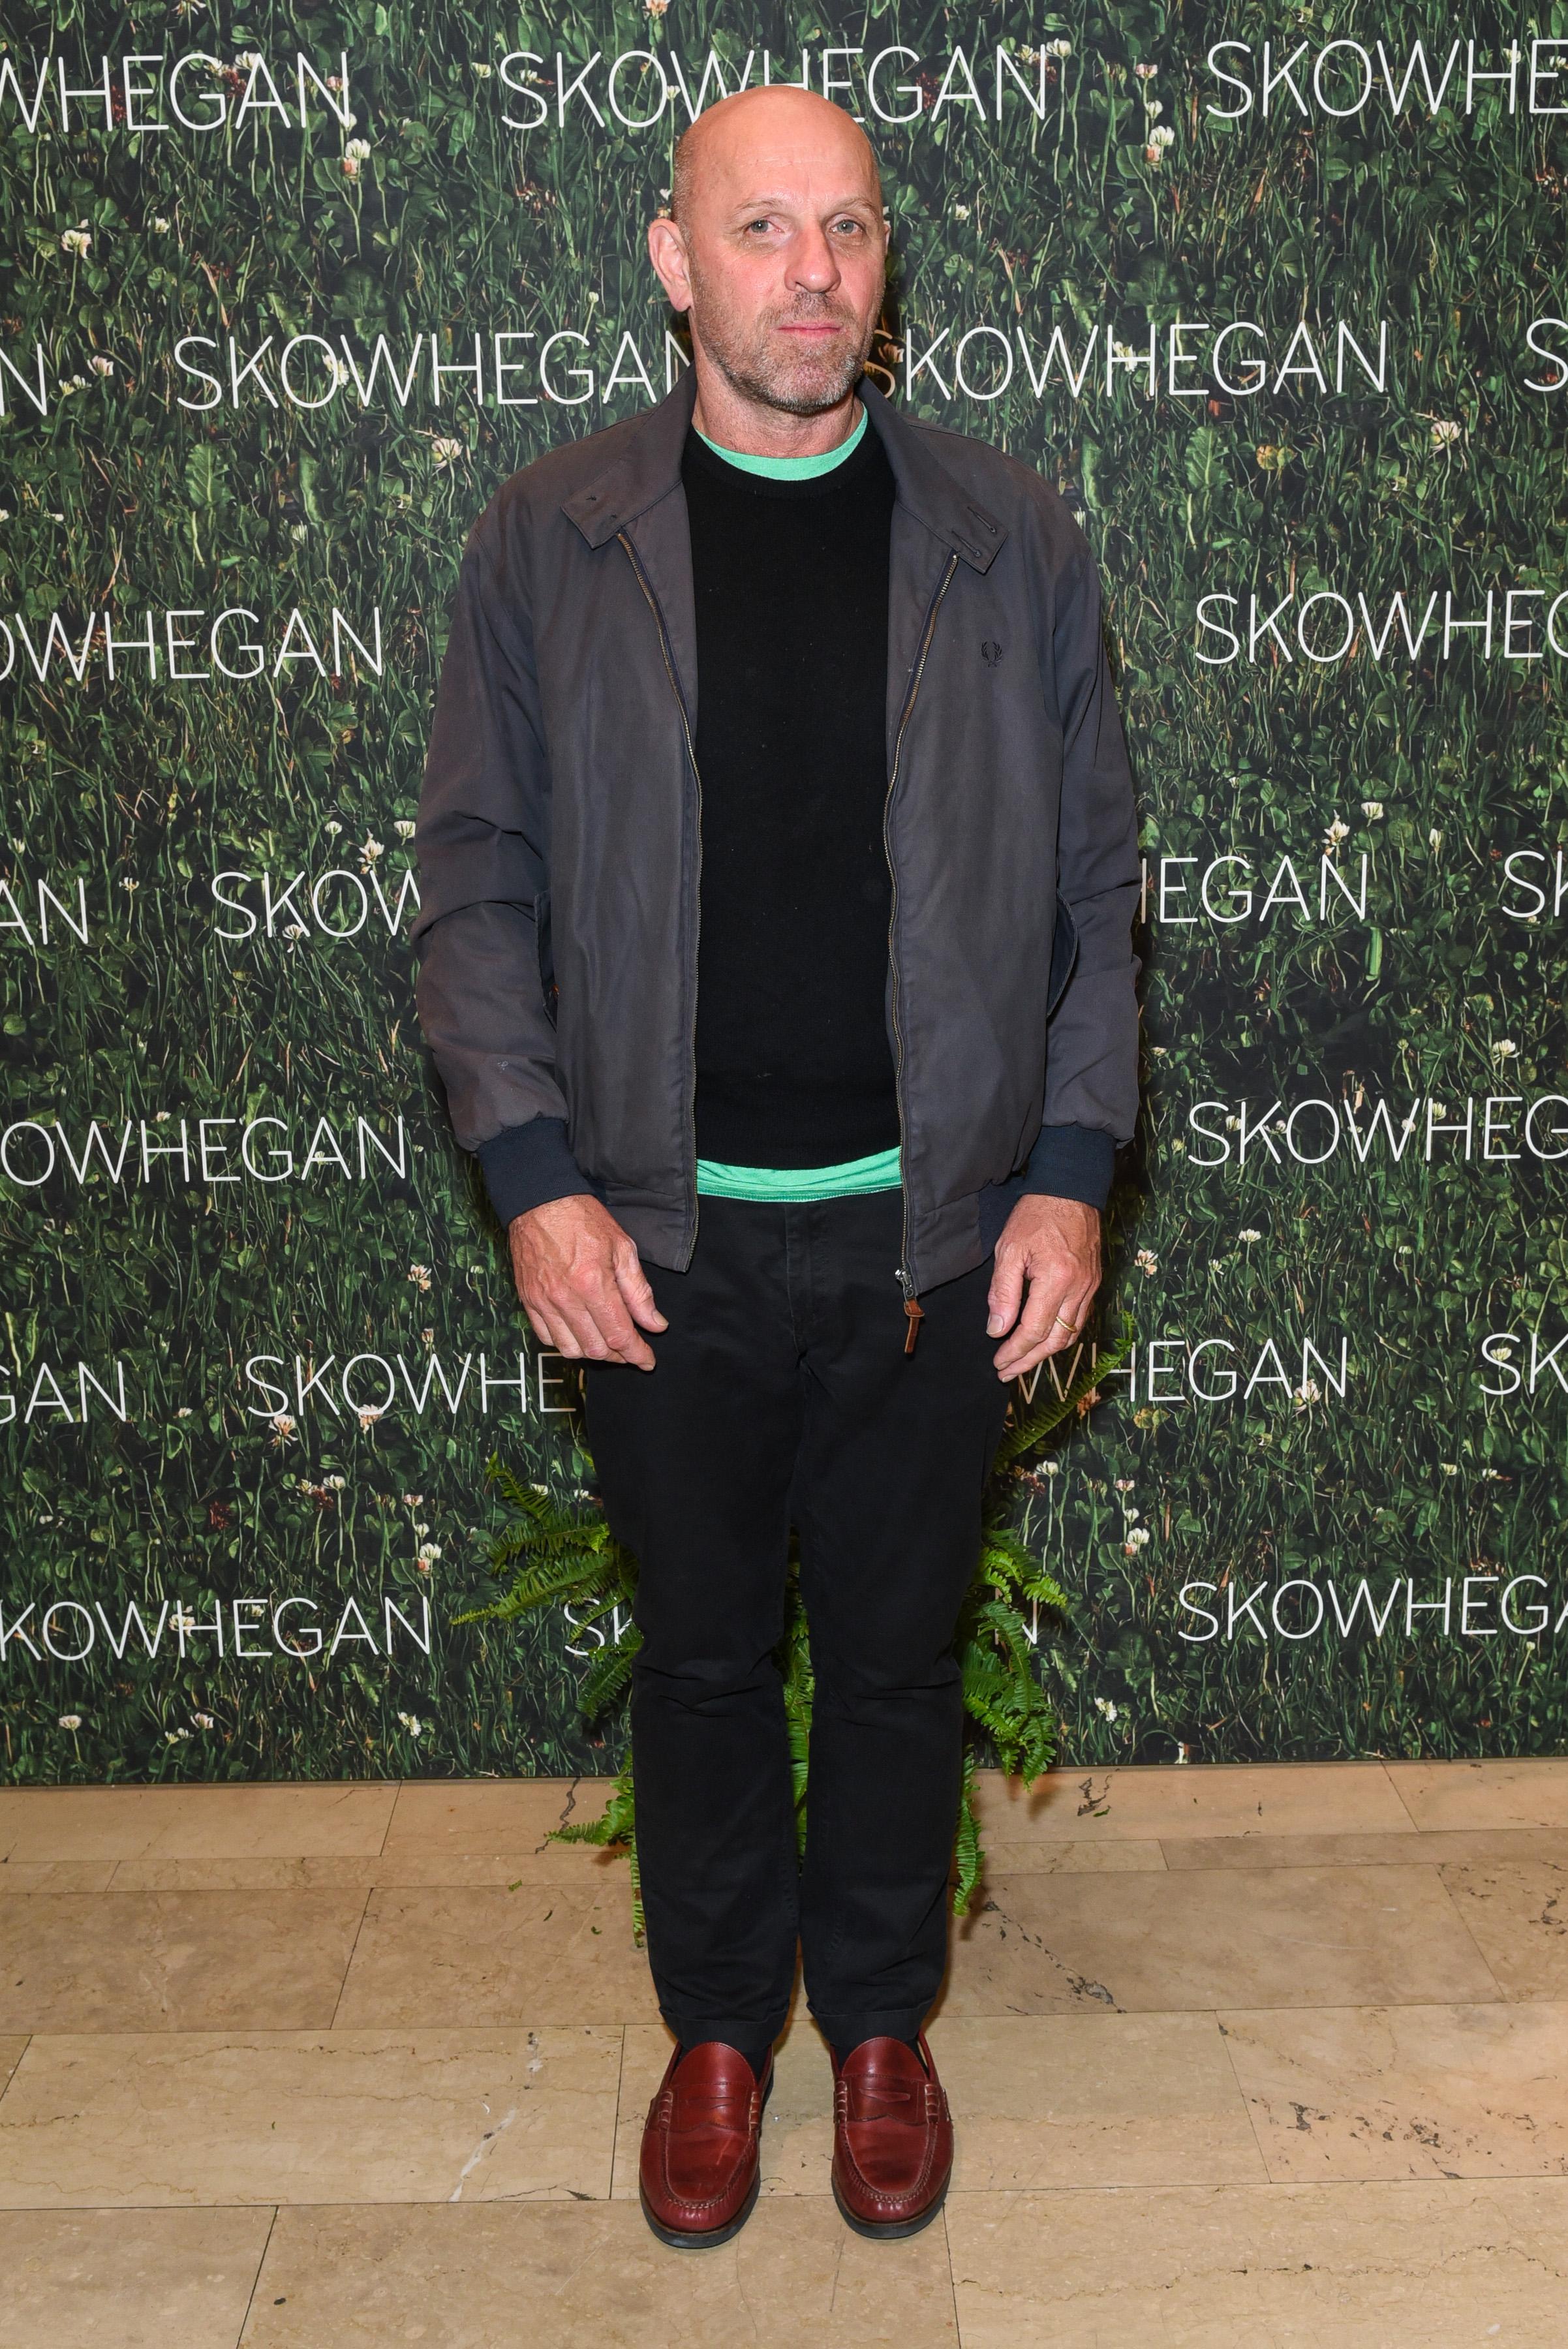 Peter Doig==Skowhegan Awards Dinner 2018==The Plaza Hotel, New York, NY==April 24, 2018==�Patrick McMullan==Photo - Presley Ann/PMC====